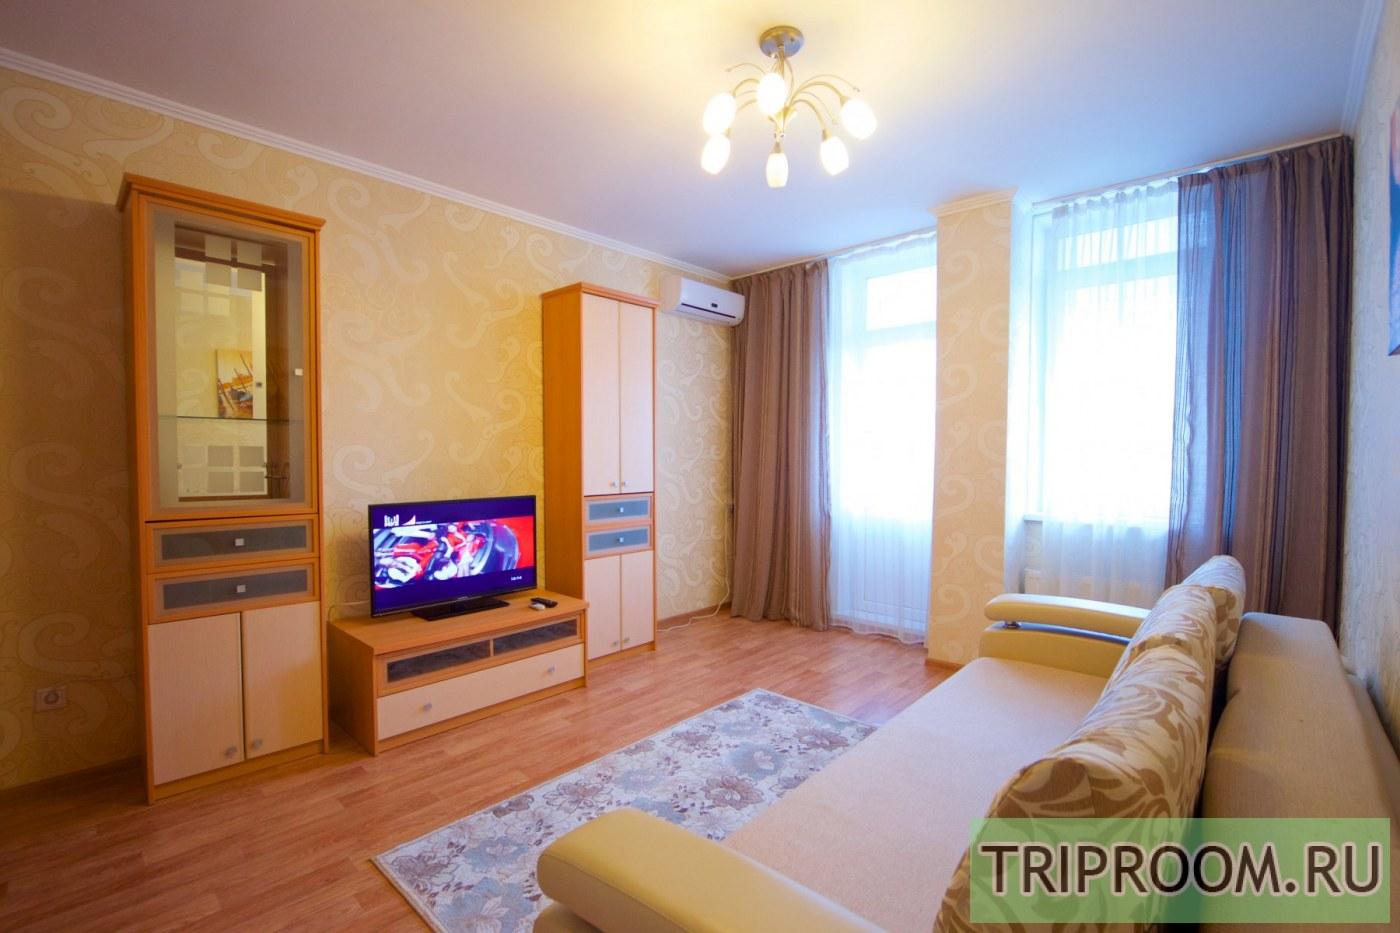 1-комнатная квартира посуточно (вариант № 40369), ул. Алексеева улица, фото № 3